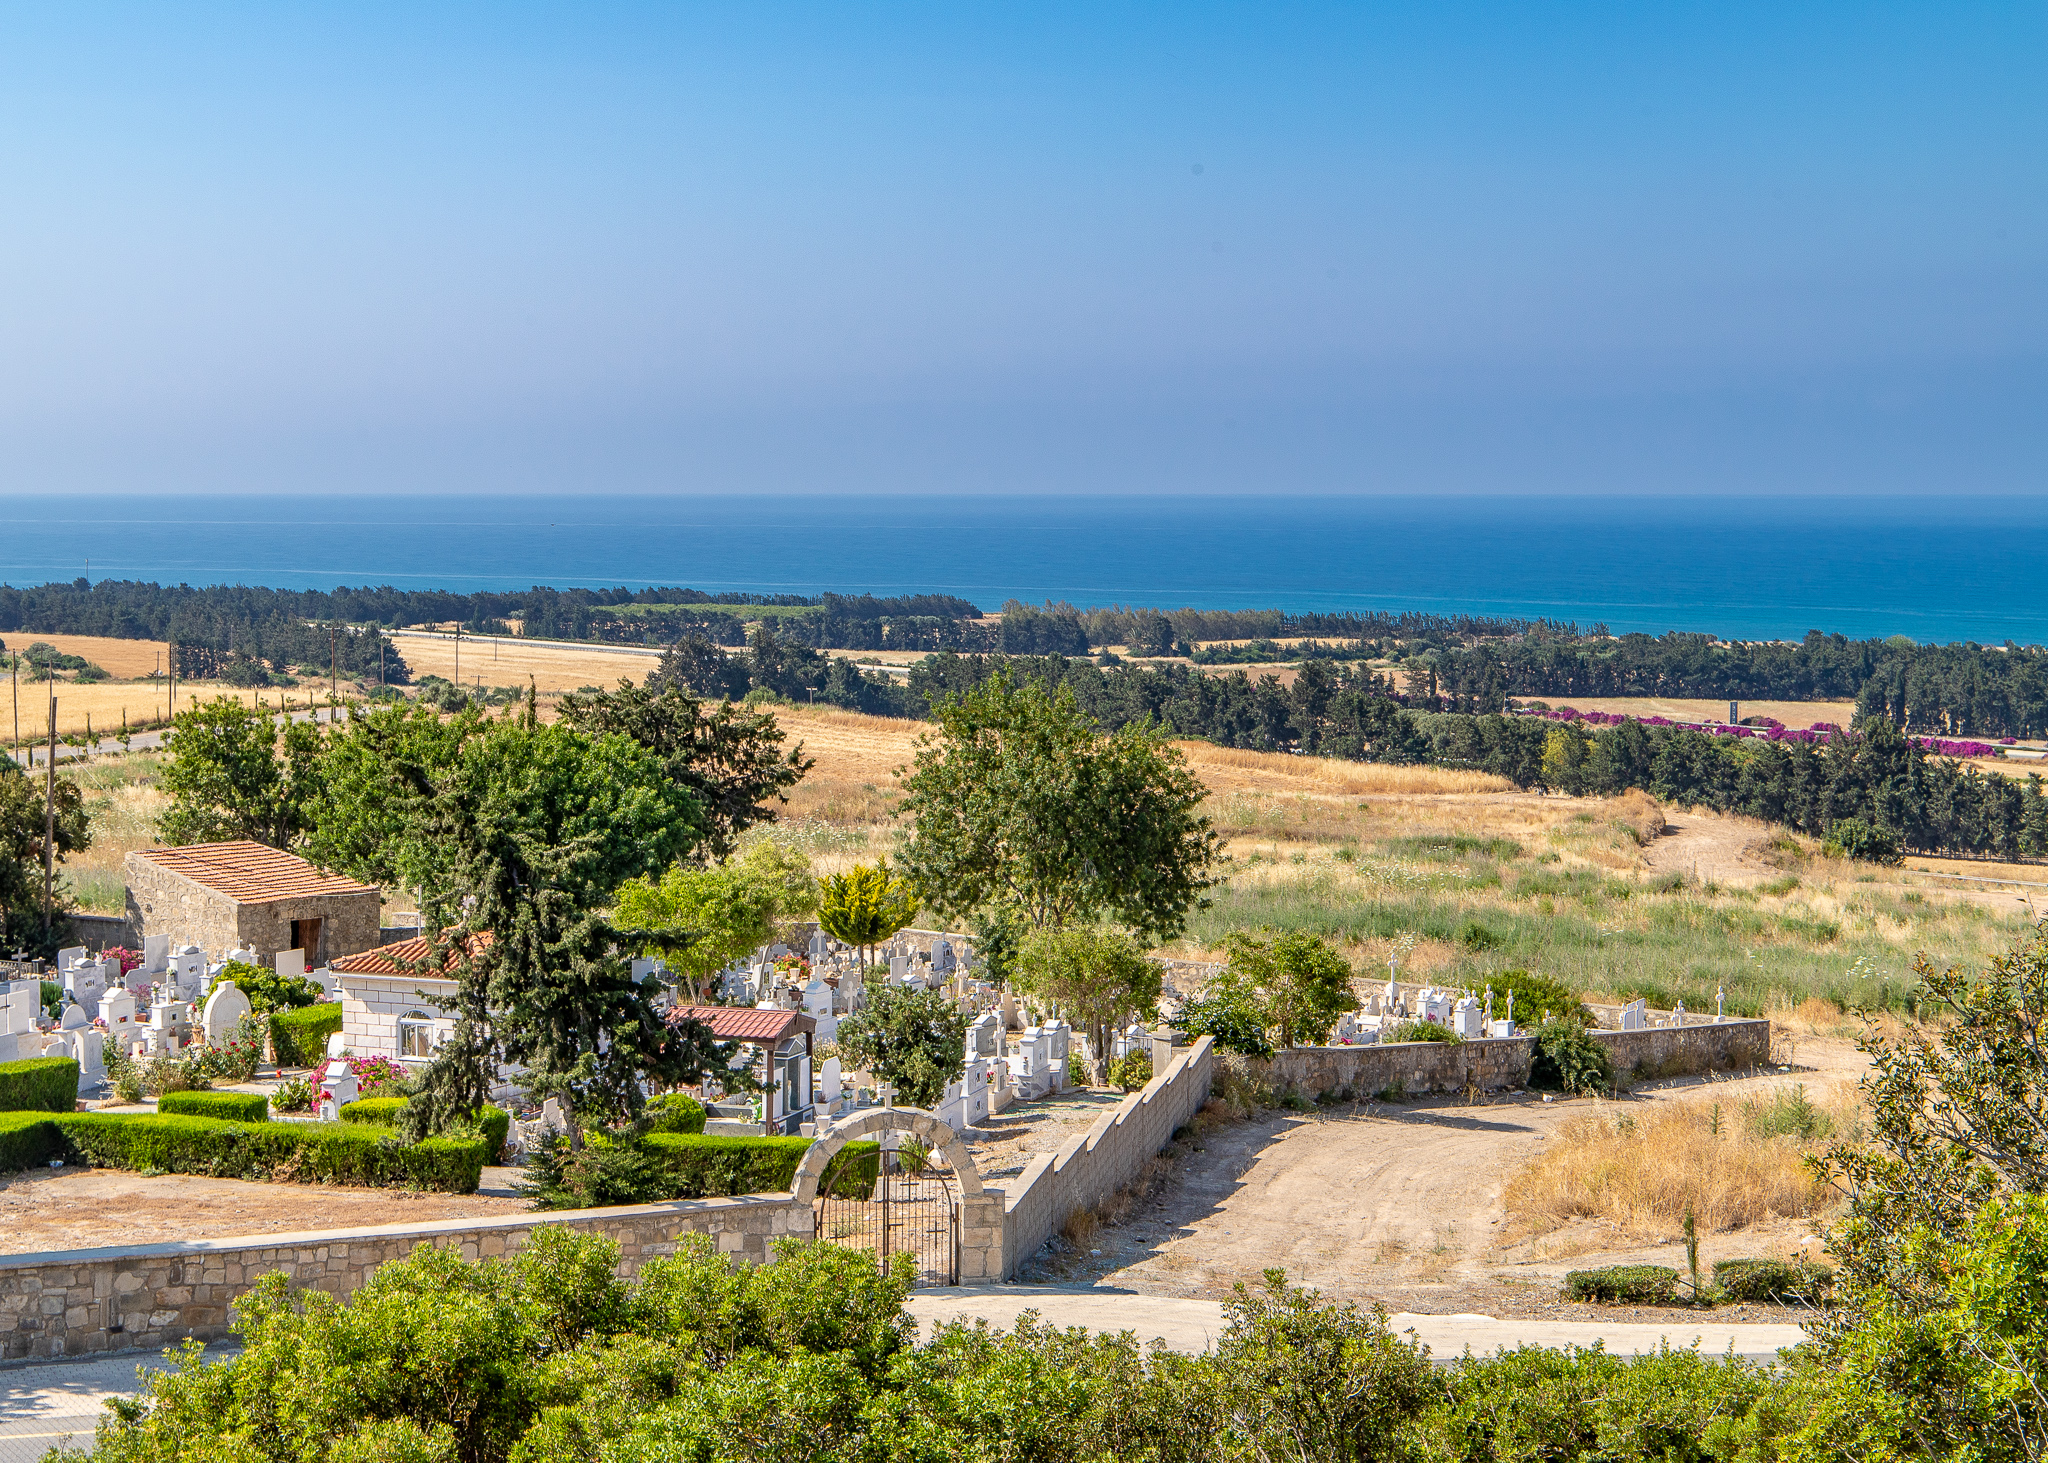 Views across a local cemetery down to the Mediterranean